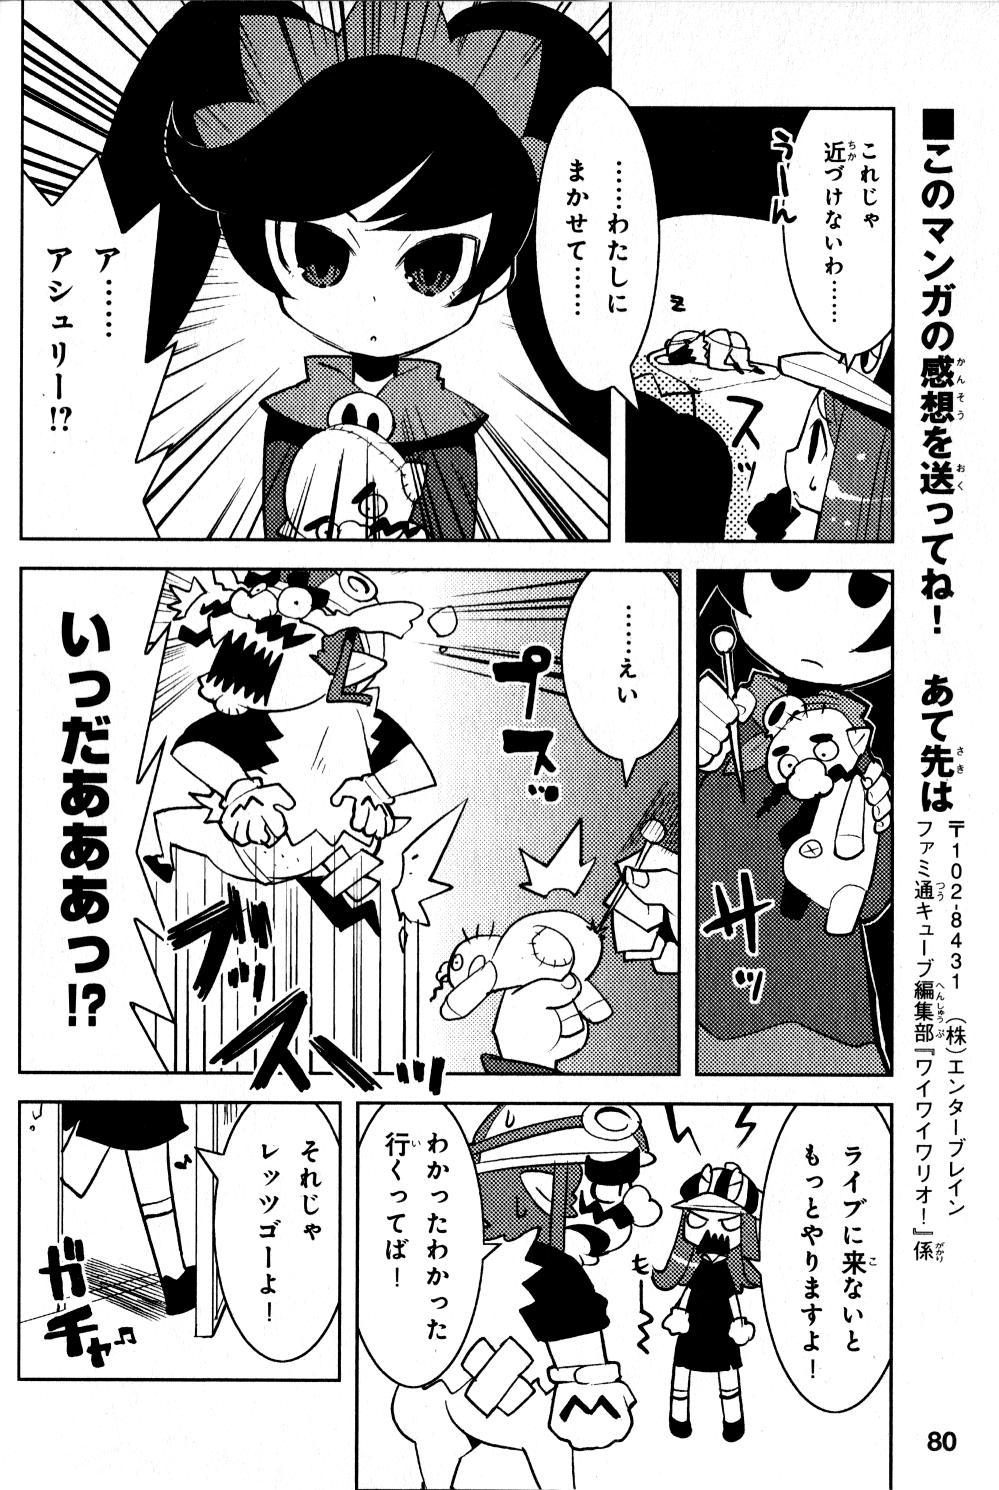 fami2comic06-02-wario06.JPG